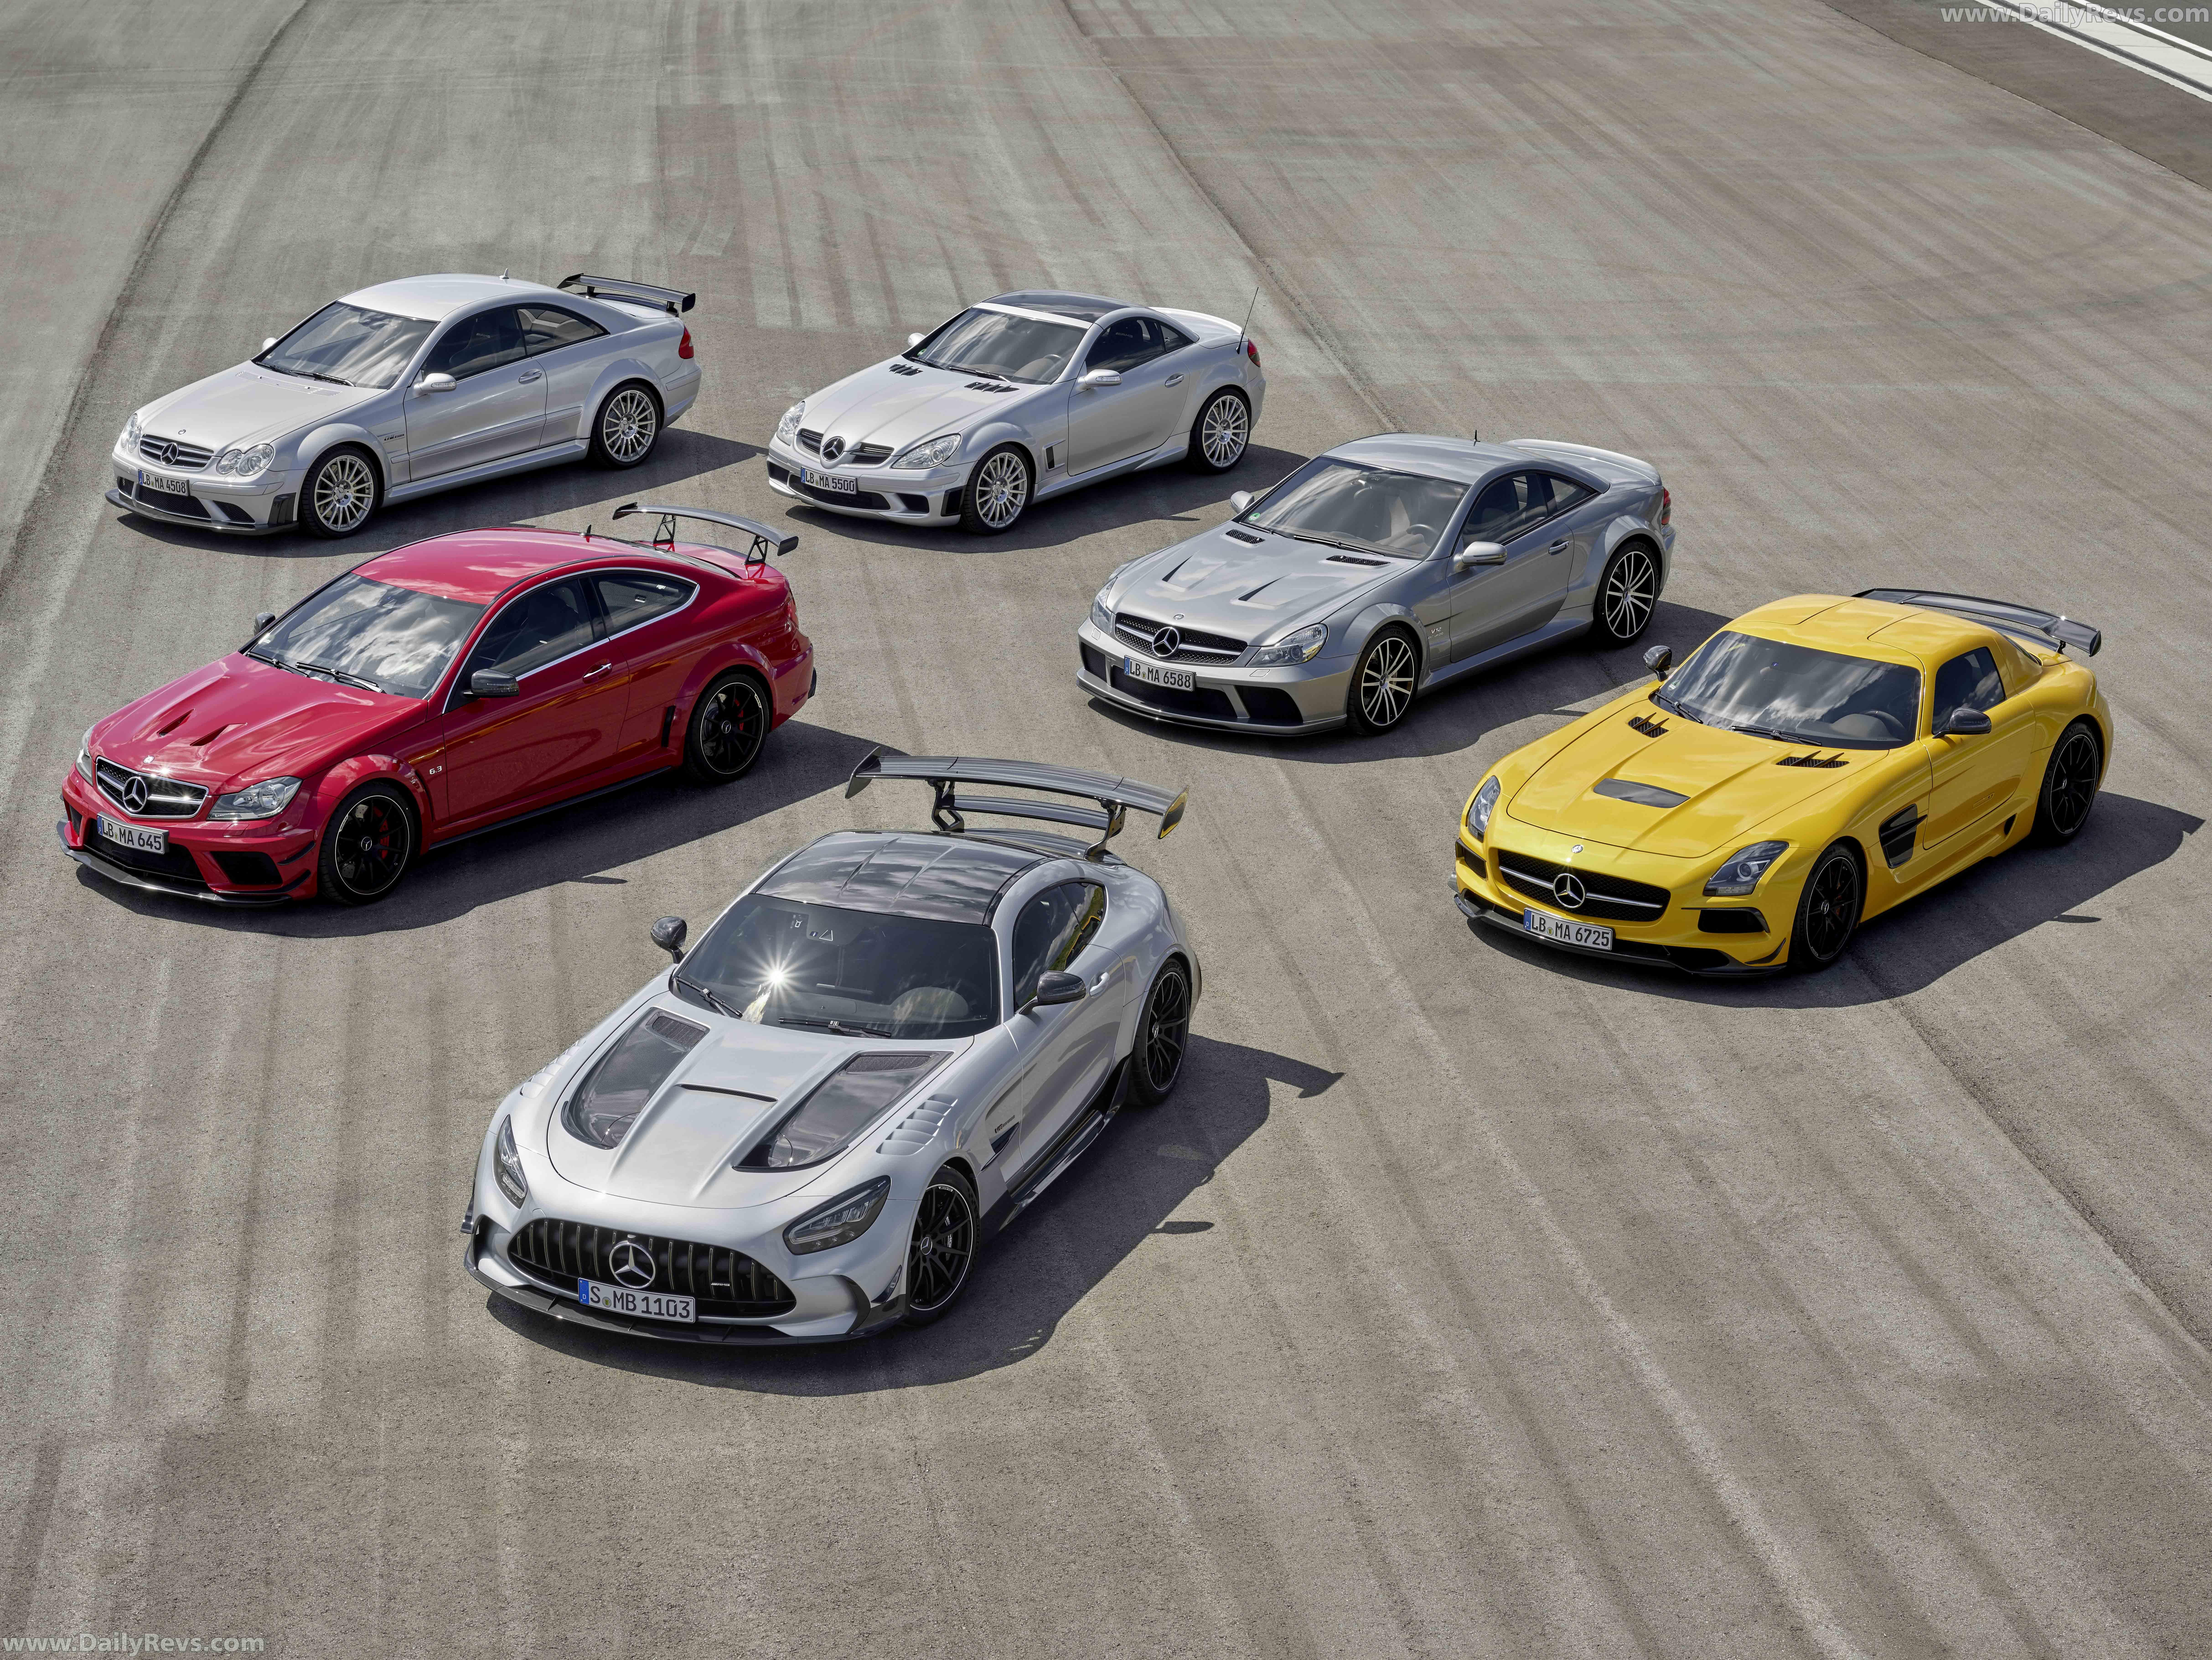 2021 Mercedes-Benz AMG GT Black Series - Dailyrevs